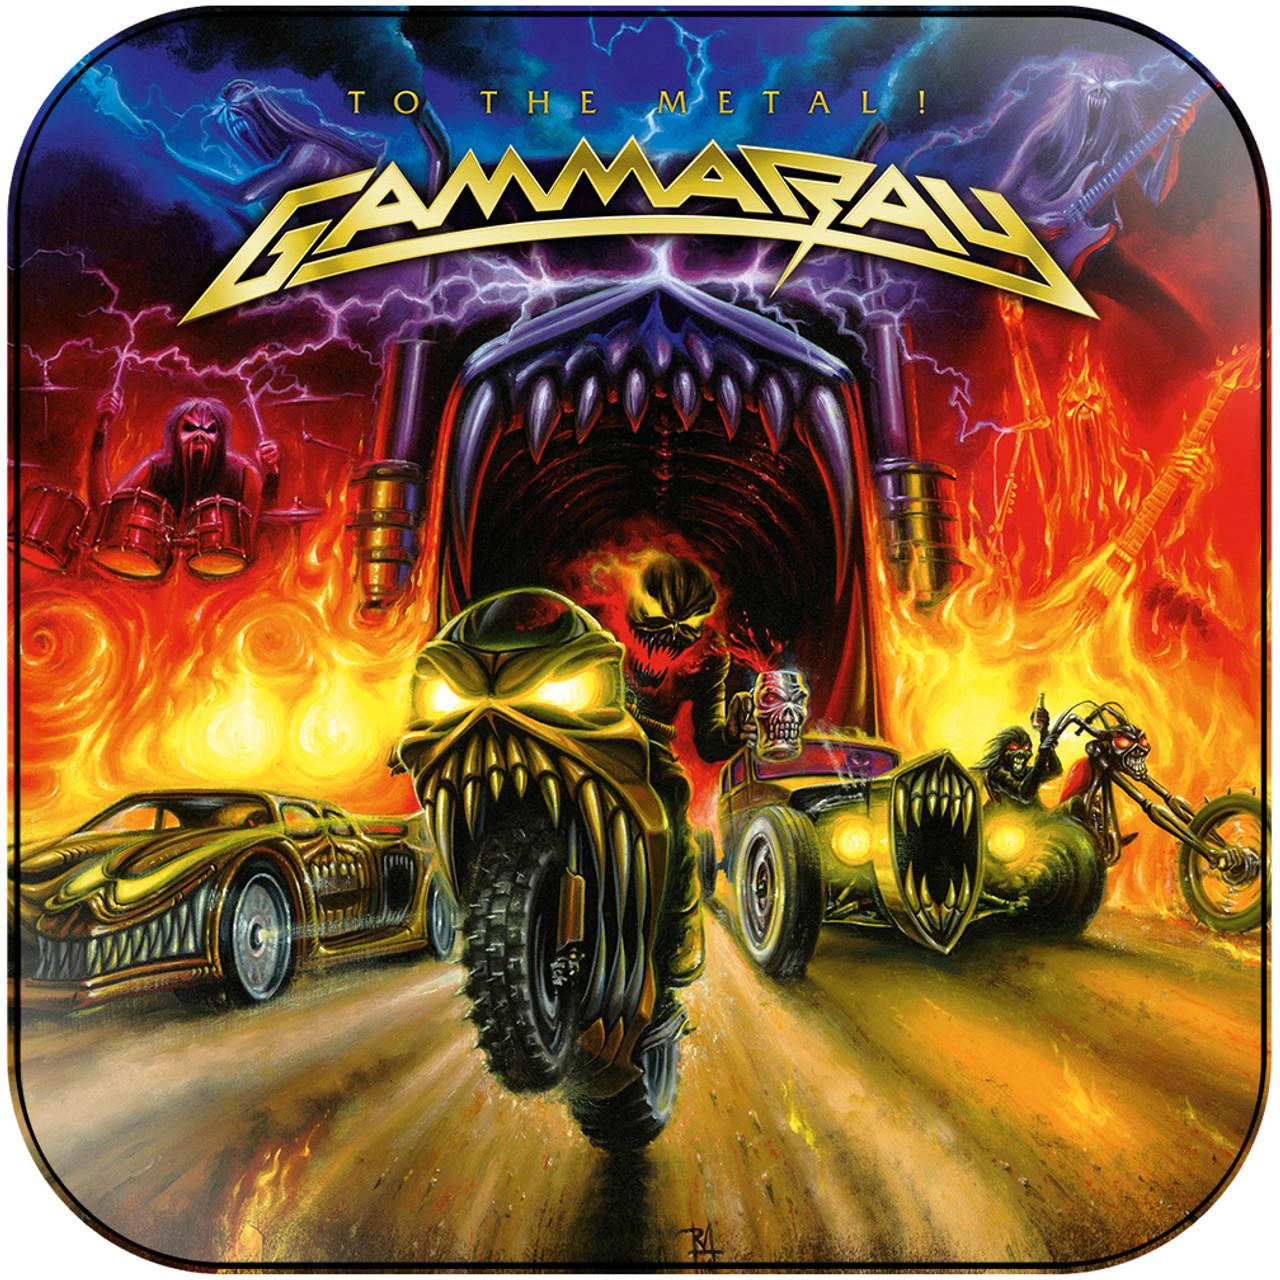 Gamma Ray To The Metal 1 Album Cover Sticker